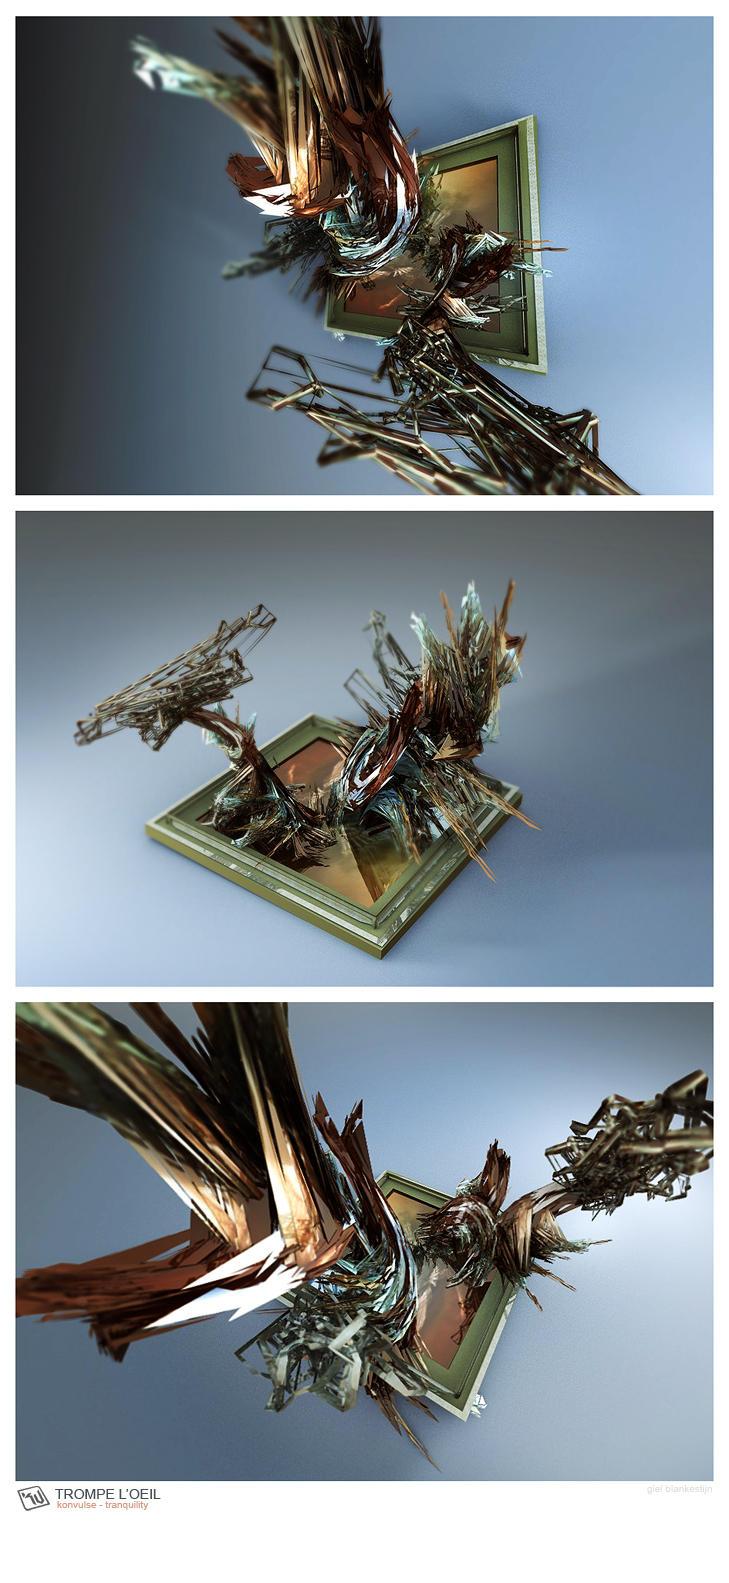 Trompe L'oeil by Godxx2